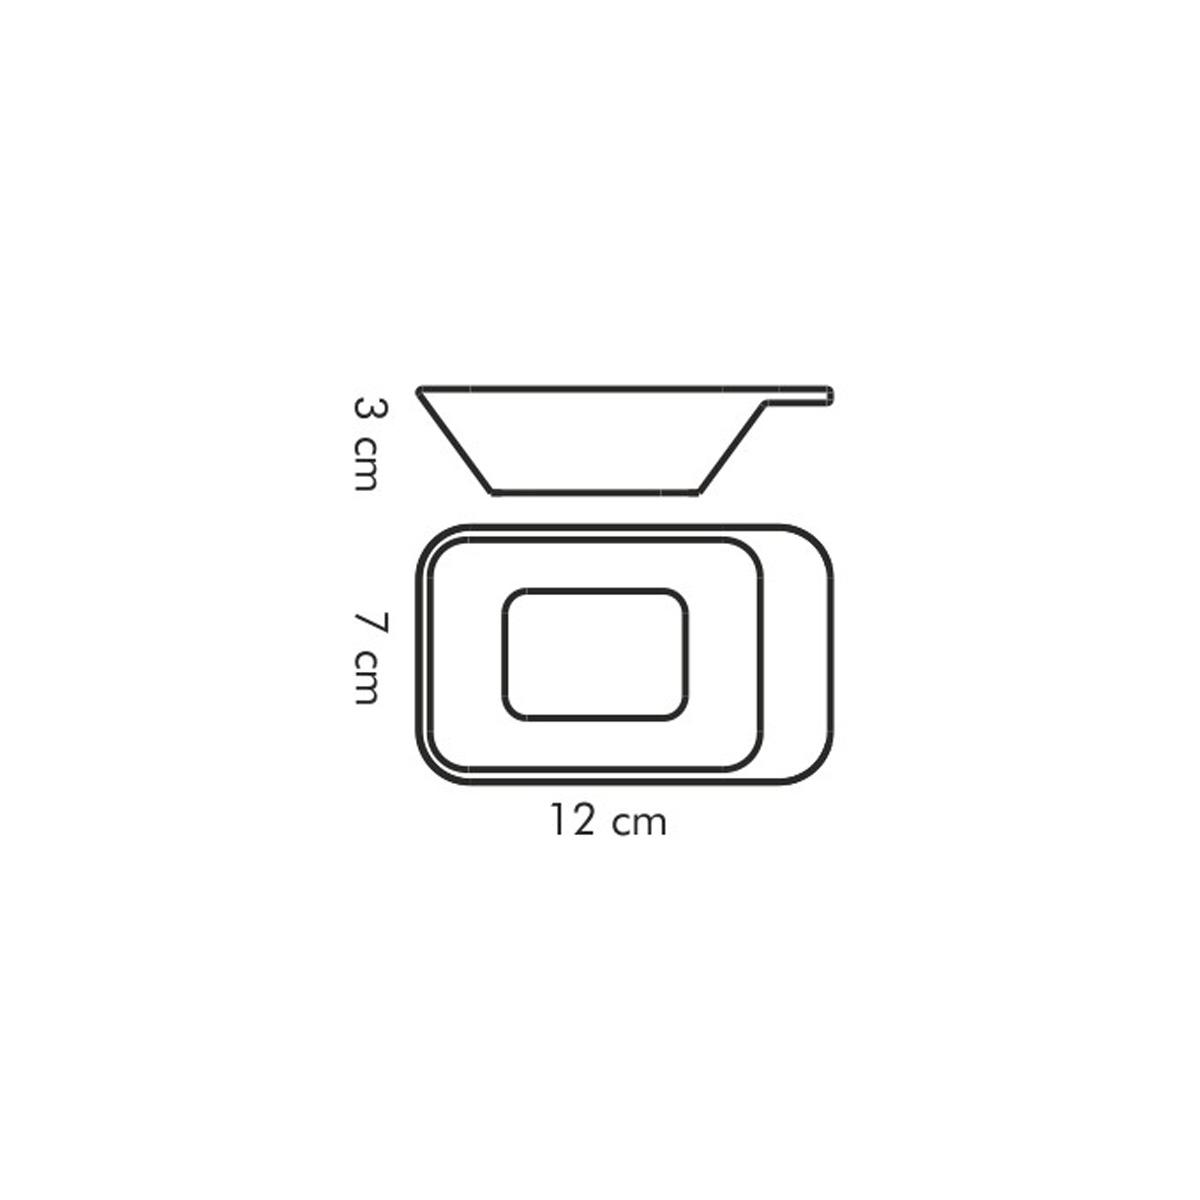 Miska na dresink GUSTITO 12x7 cm